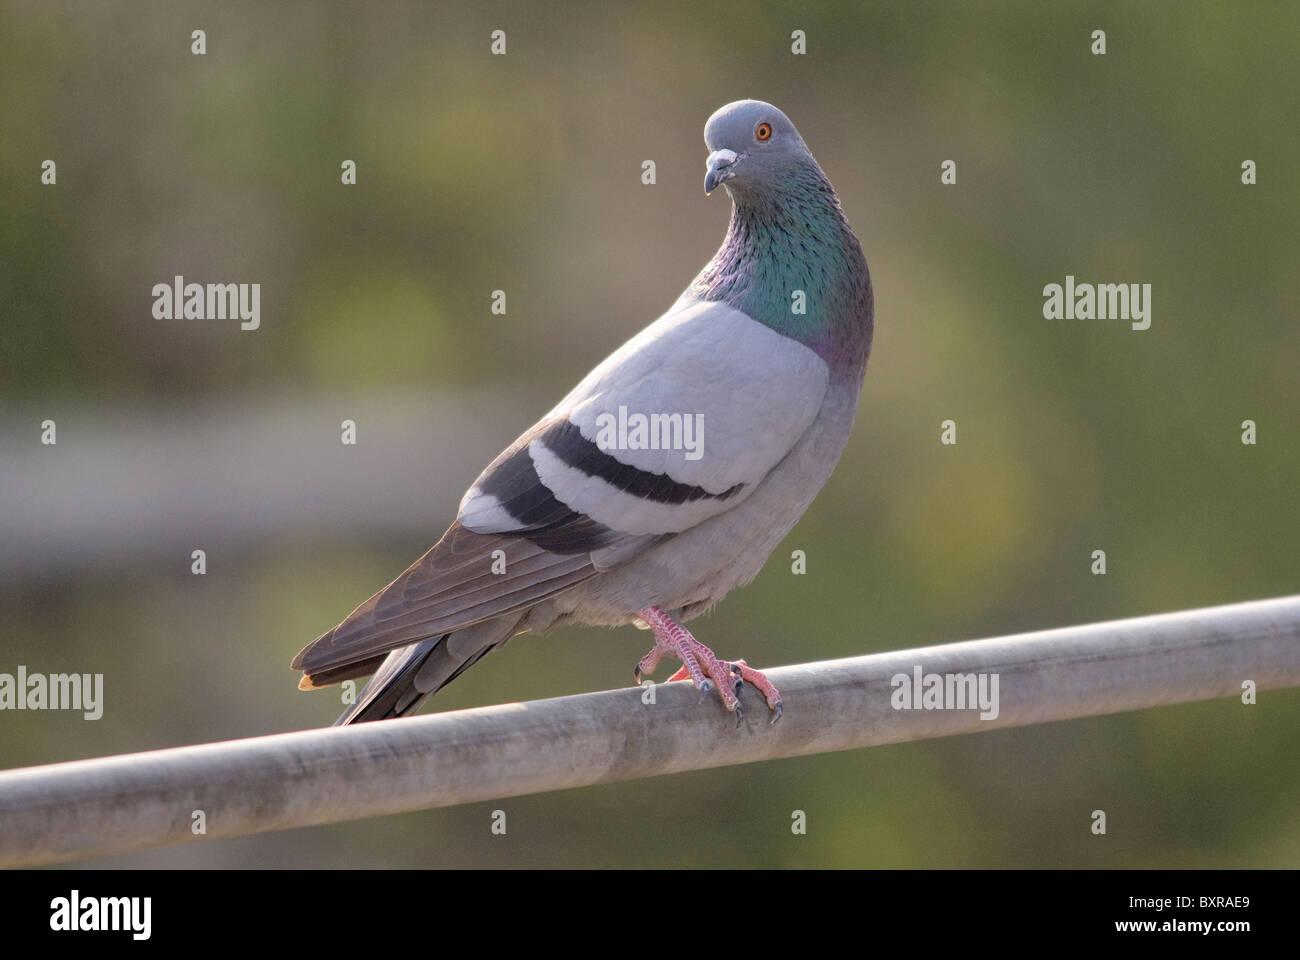 Rock Pigeon, Scientific name of the species: Columba livia - Stock Image